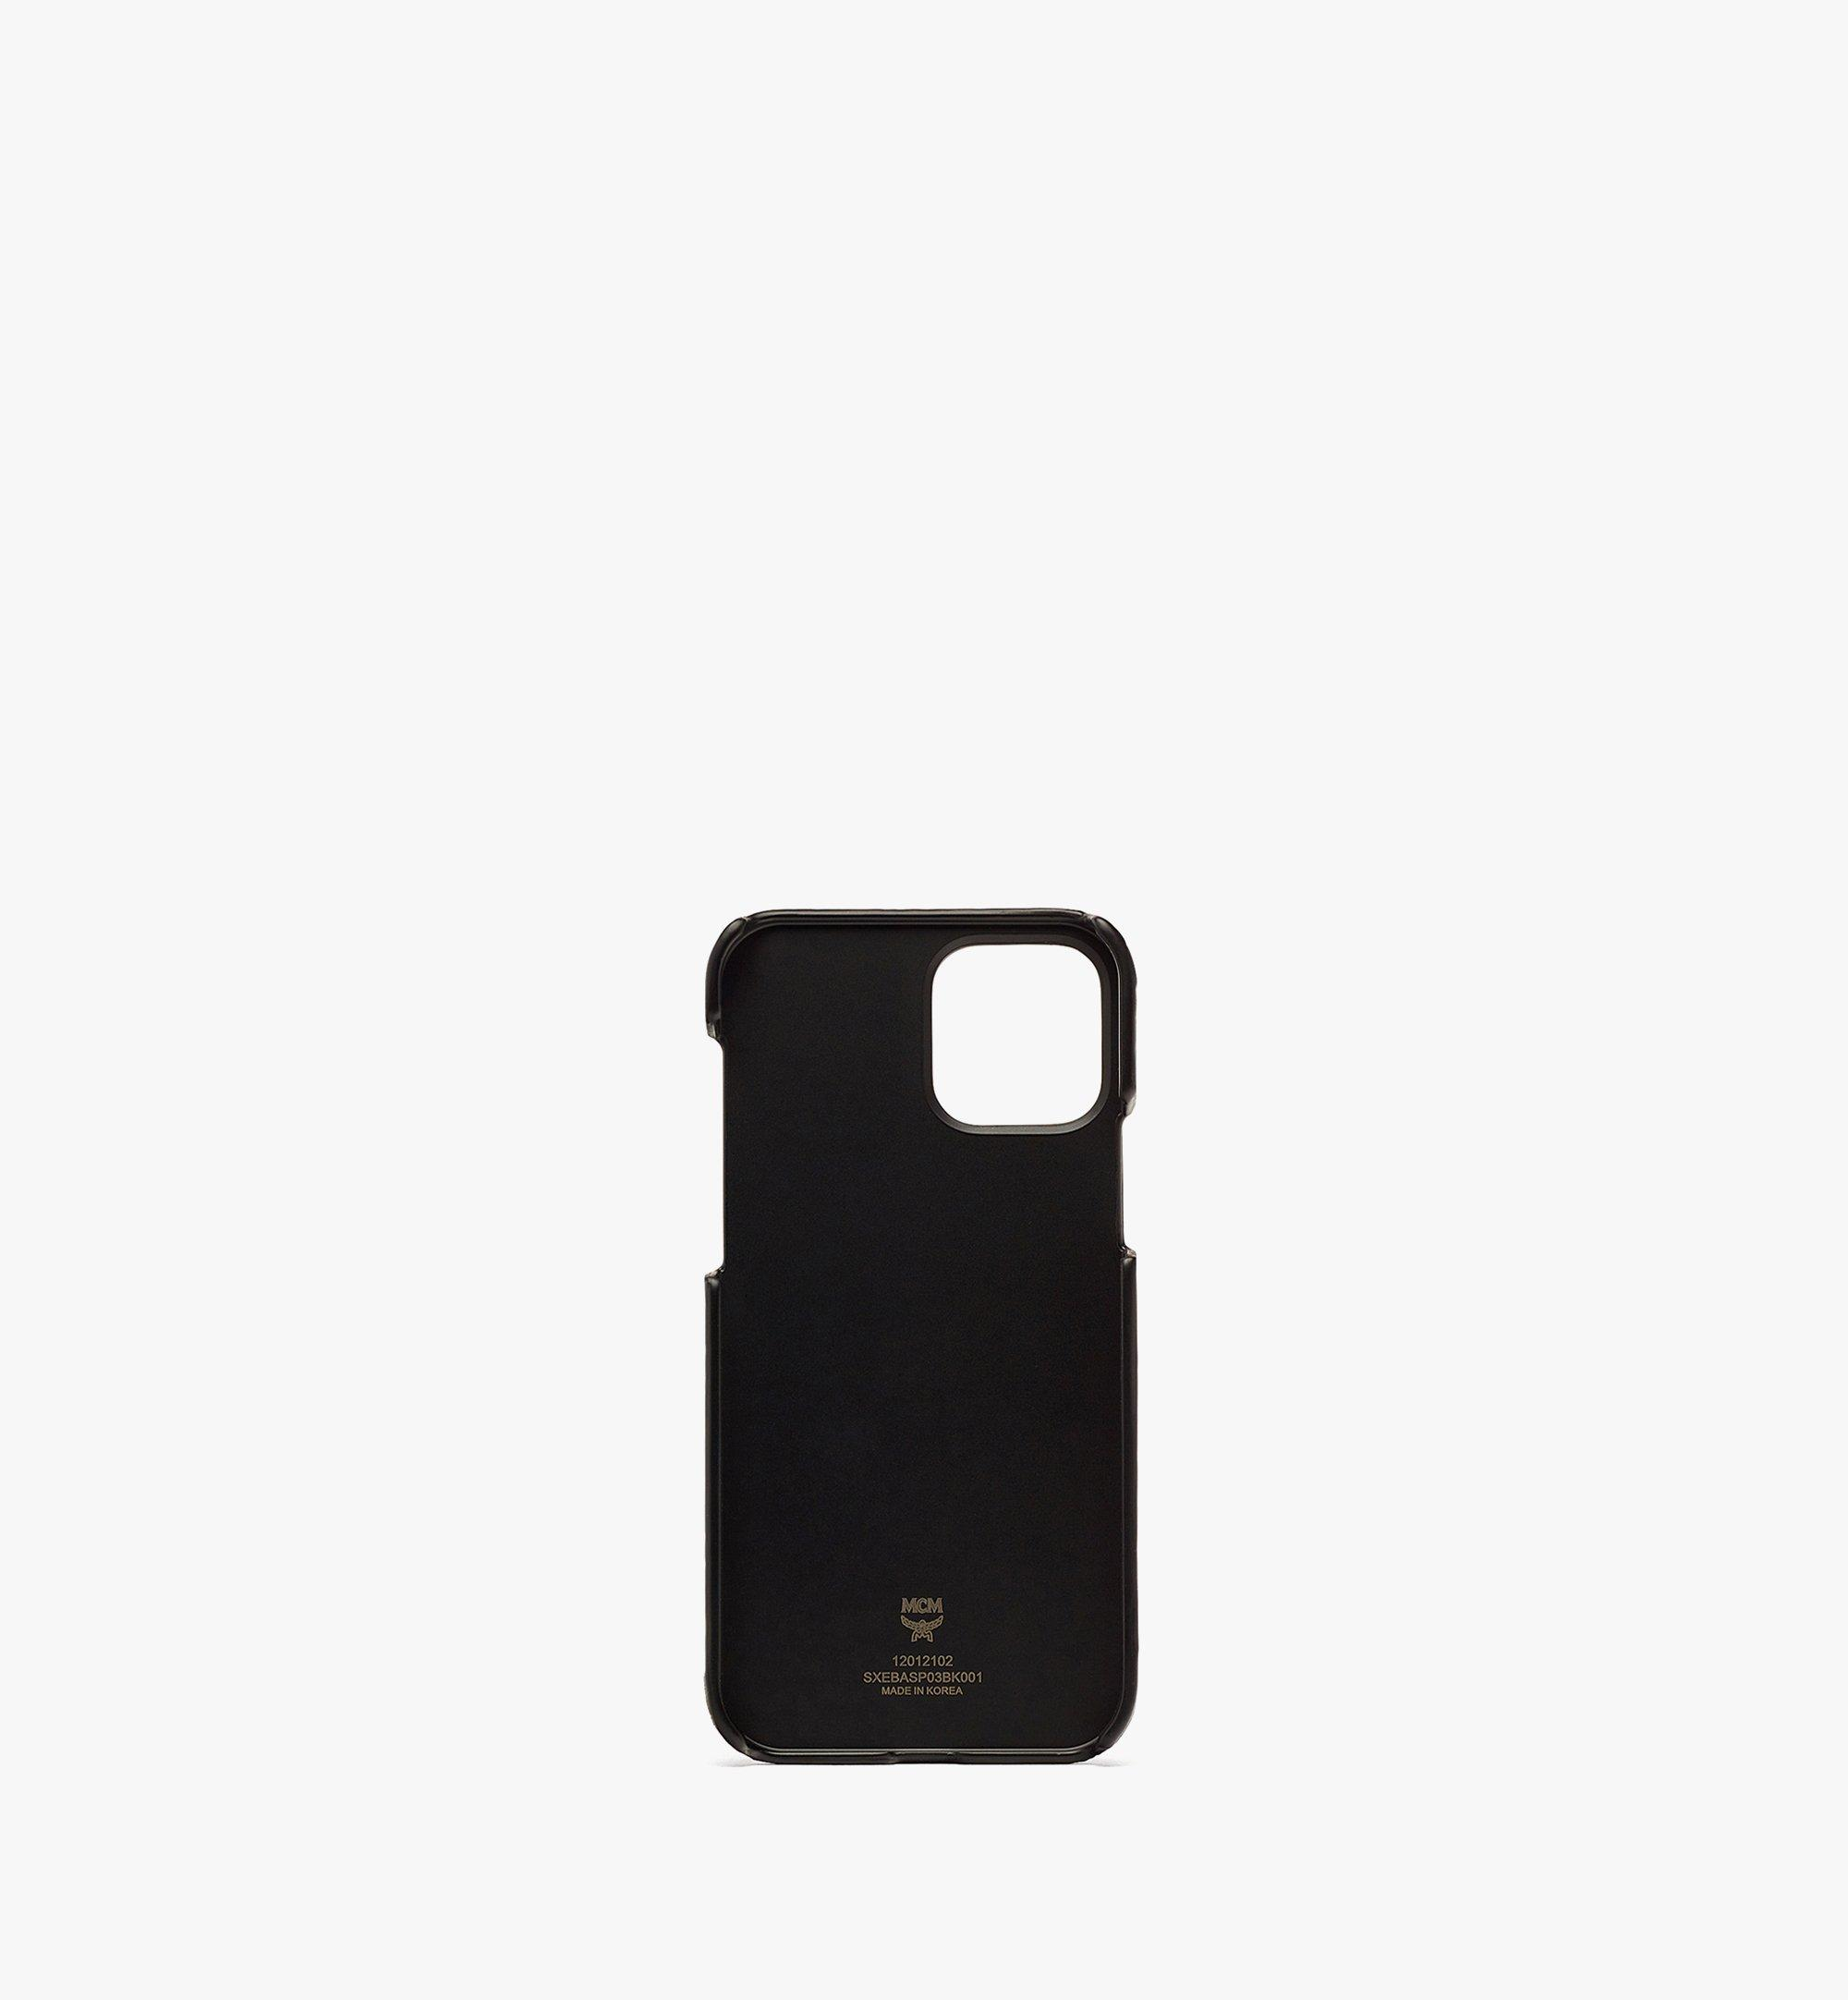 MCM MCM x SAMBYPEN iPhone 12/12 Pro Case in Visetos Black MXEBASP03BK001 Alternate View 1